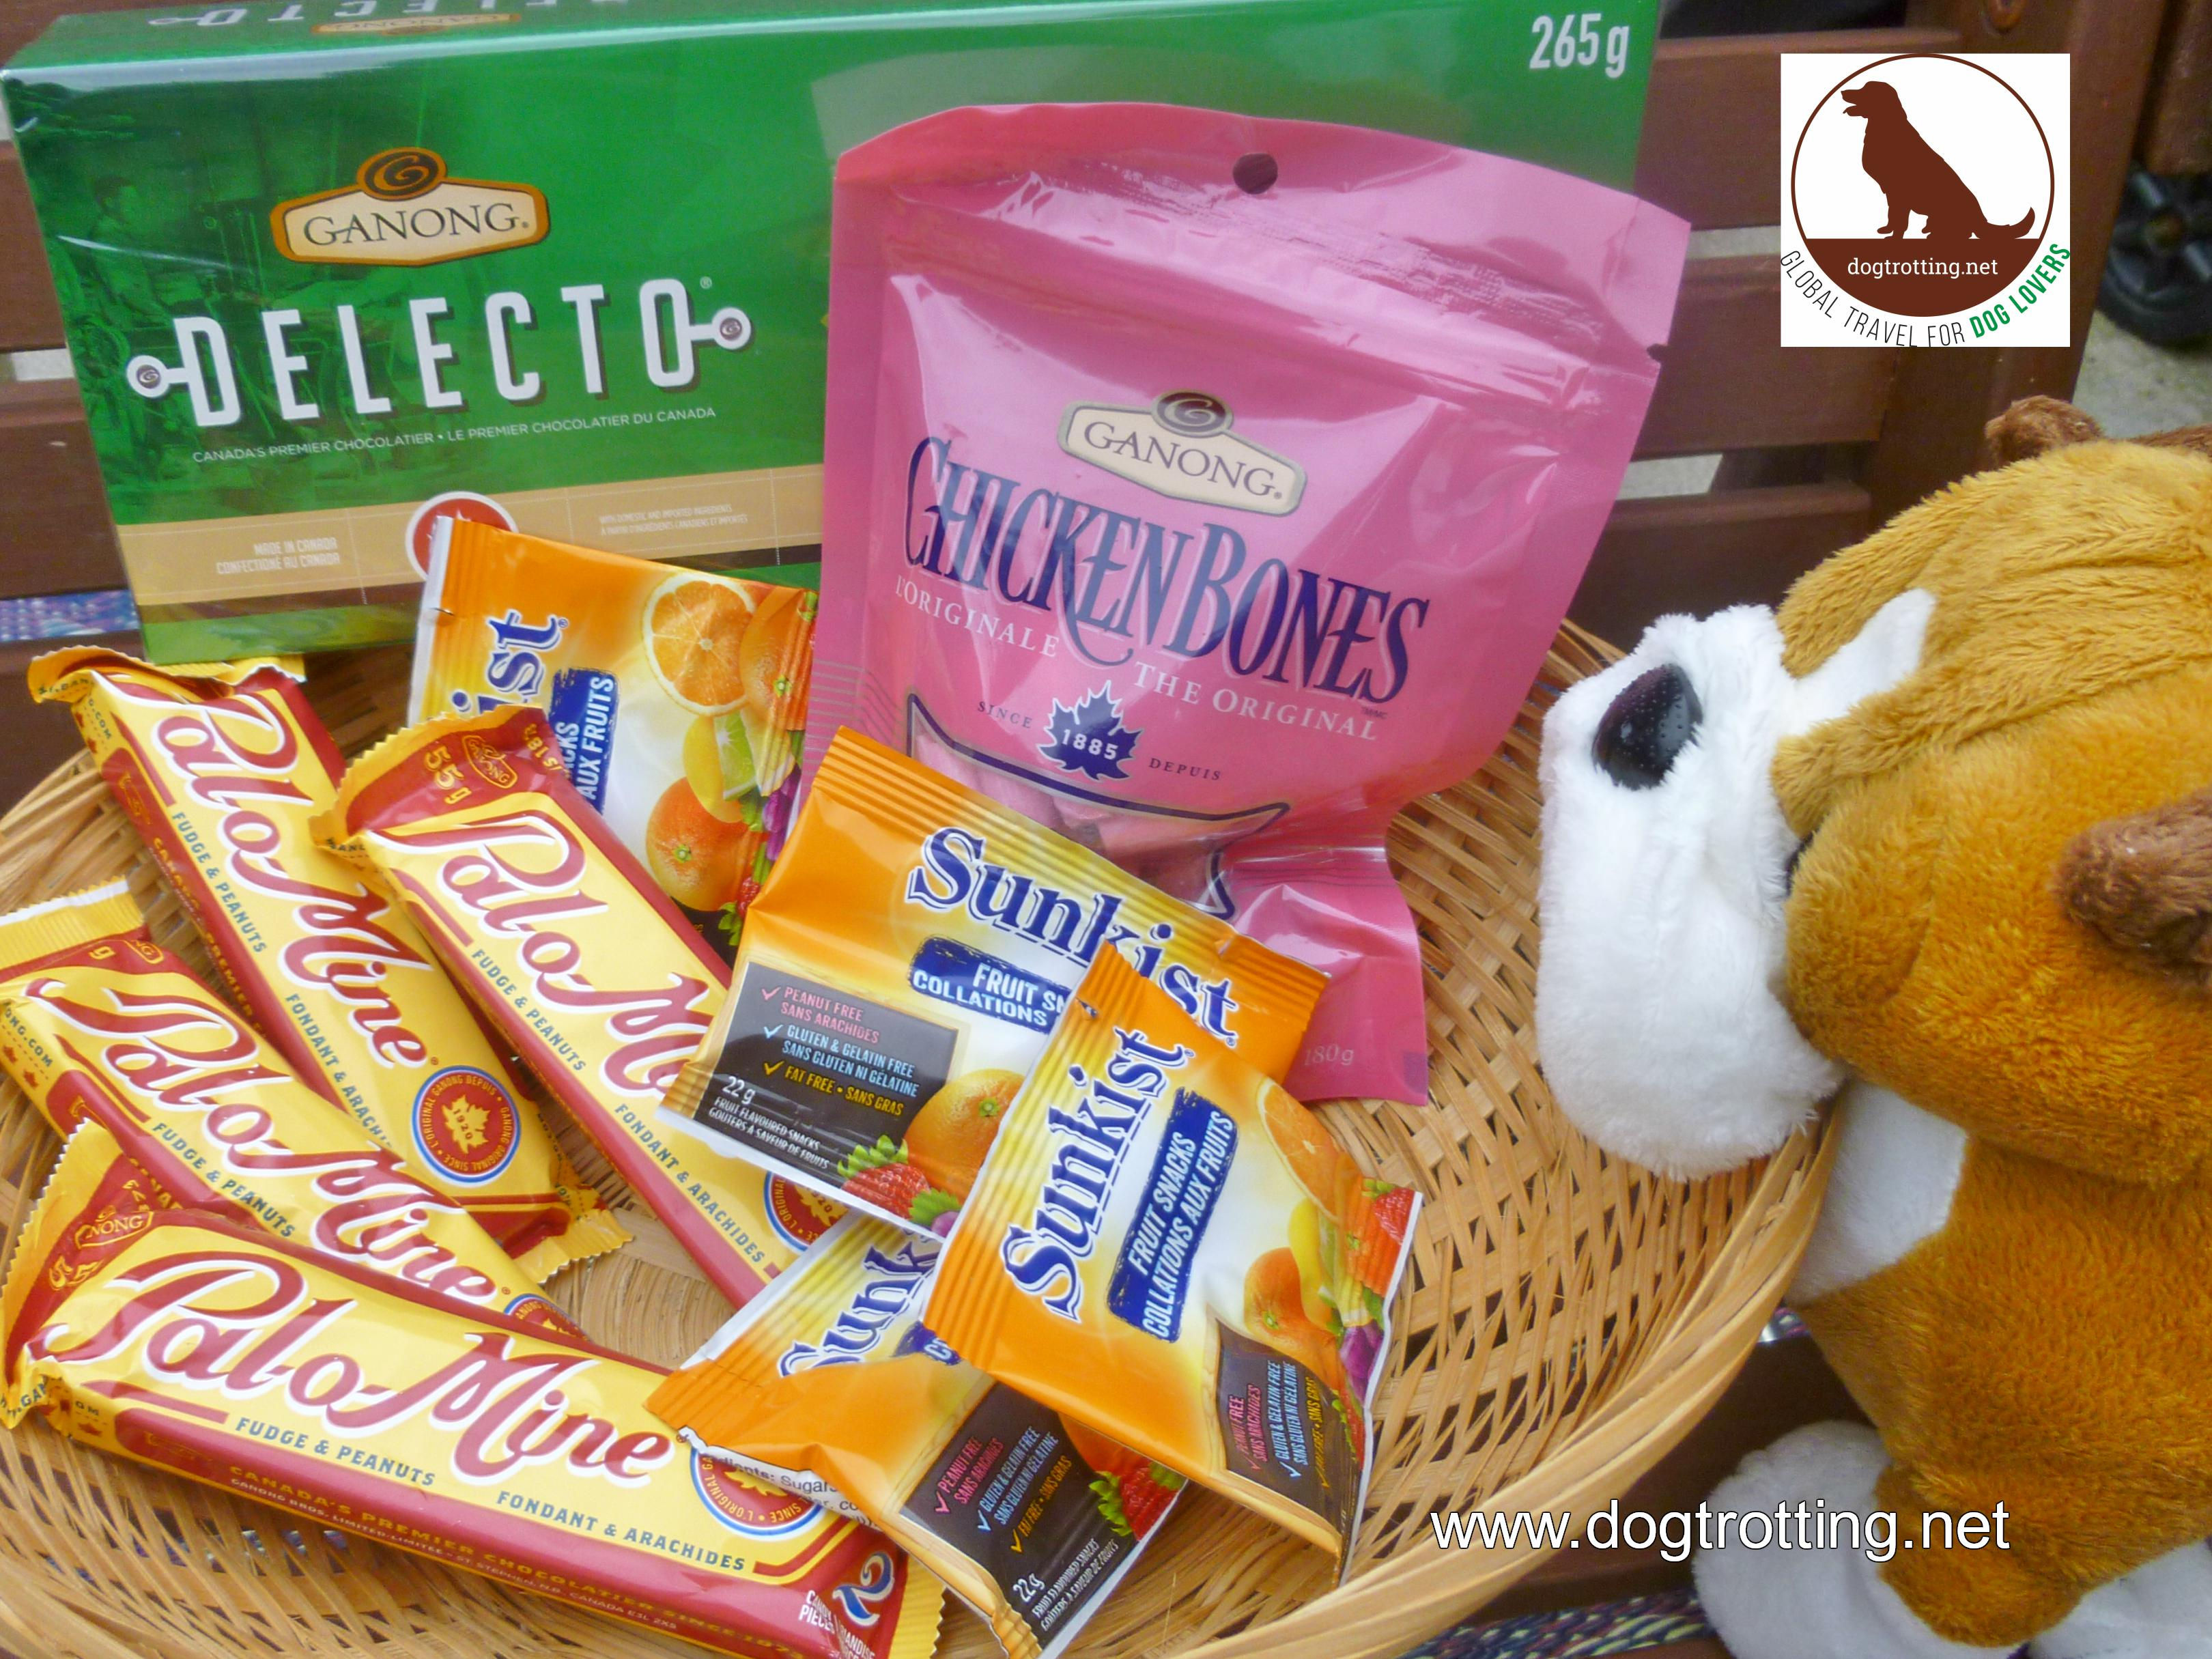 basket of Ganong chocolates